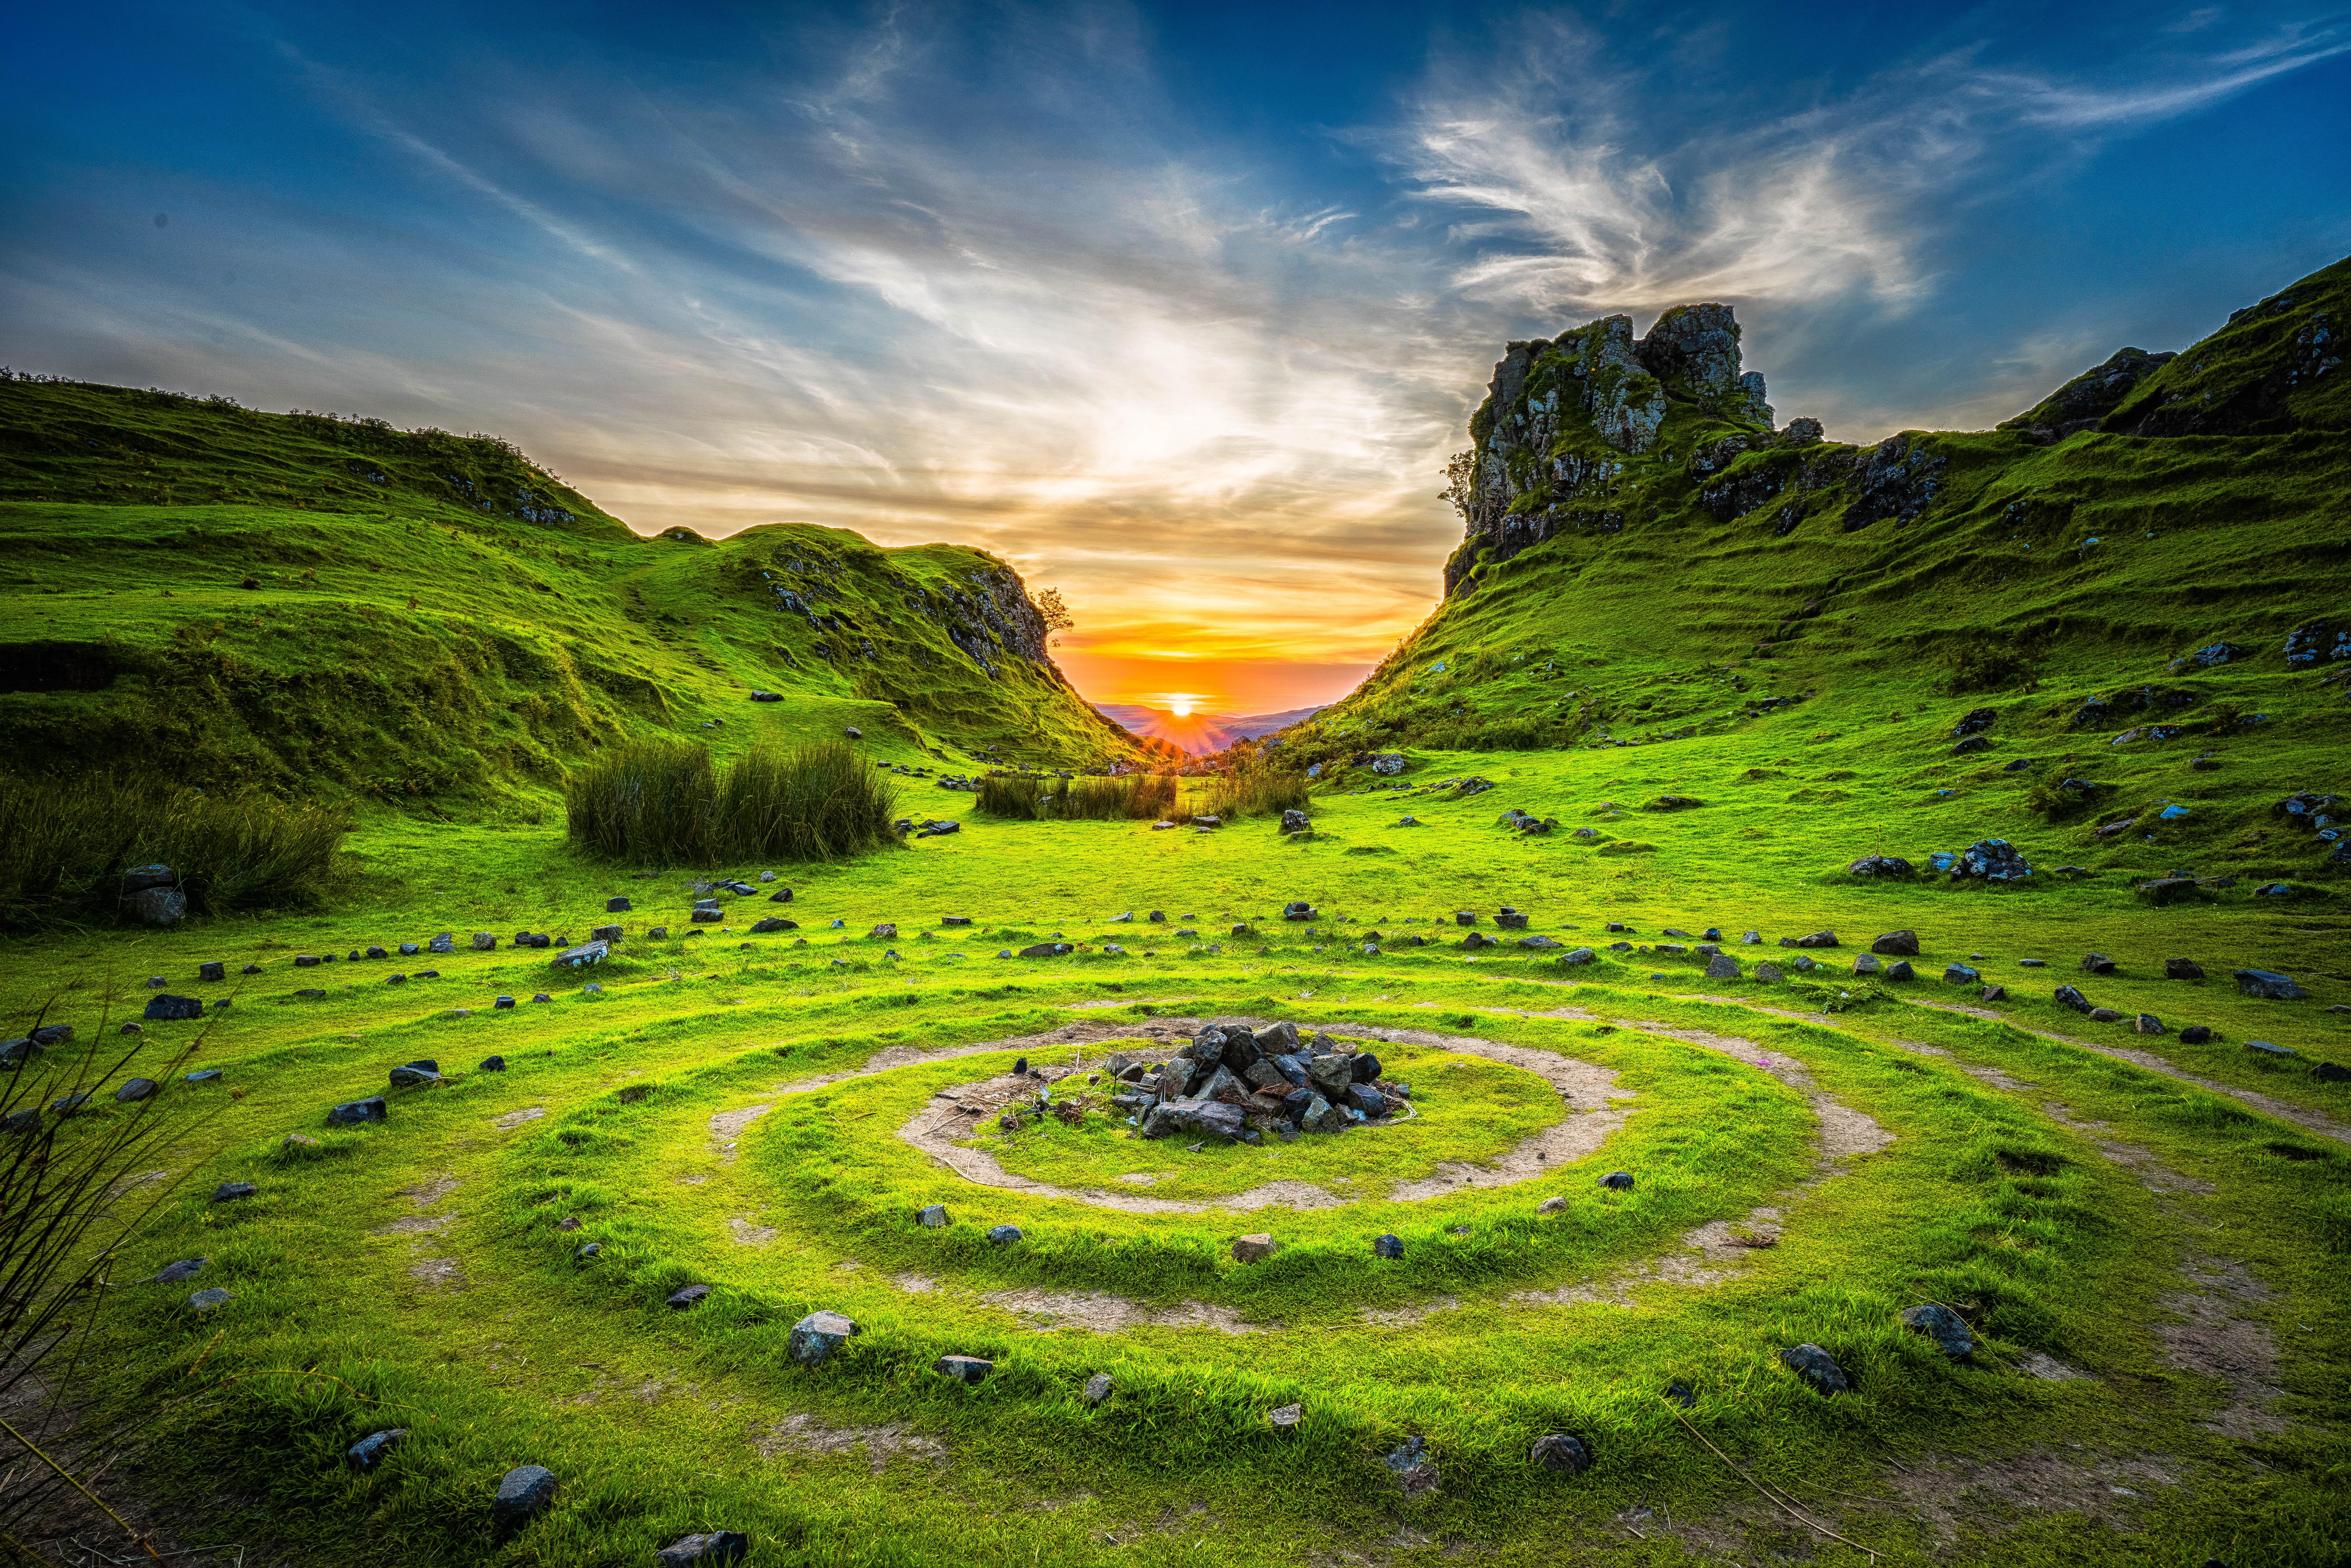 magical landscape 4k ultra hd wallpaper | background image